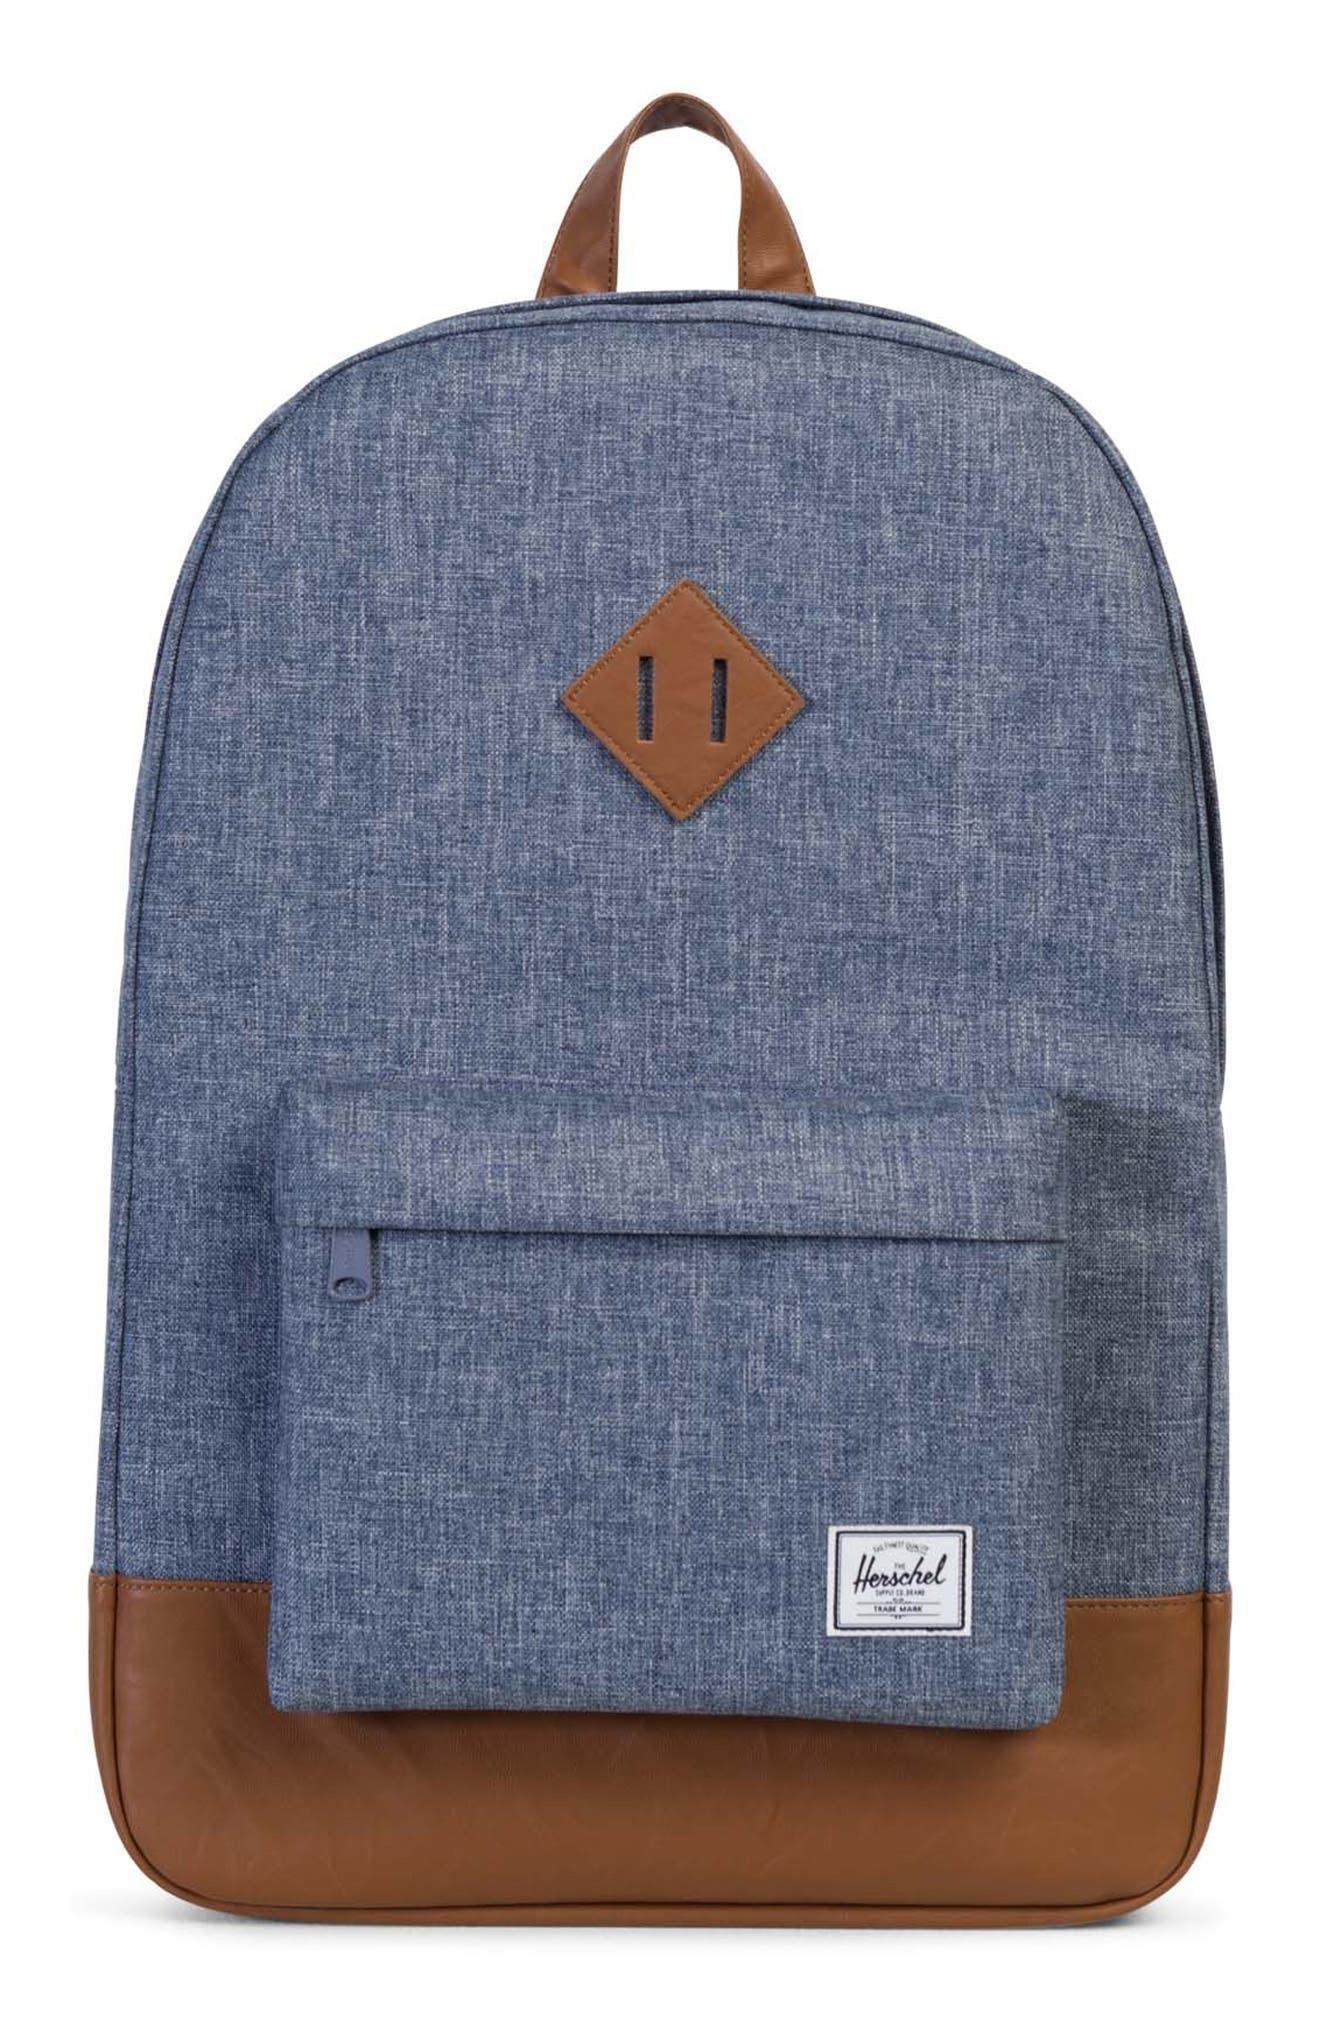 Heritage Backpack,                             Main thumbnail 1, color,                             Dark Blue Crosshatch/ Tan